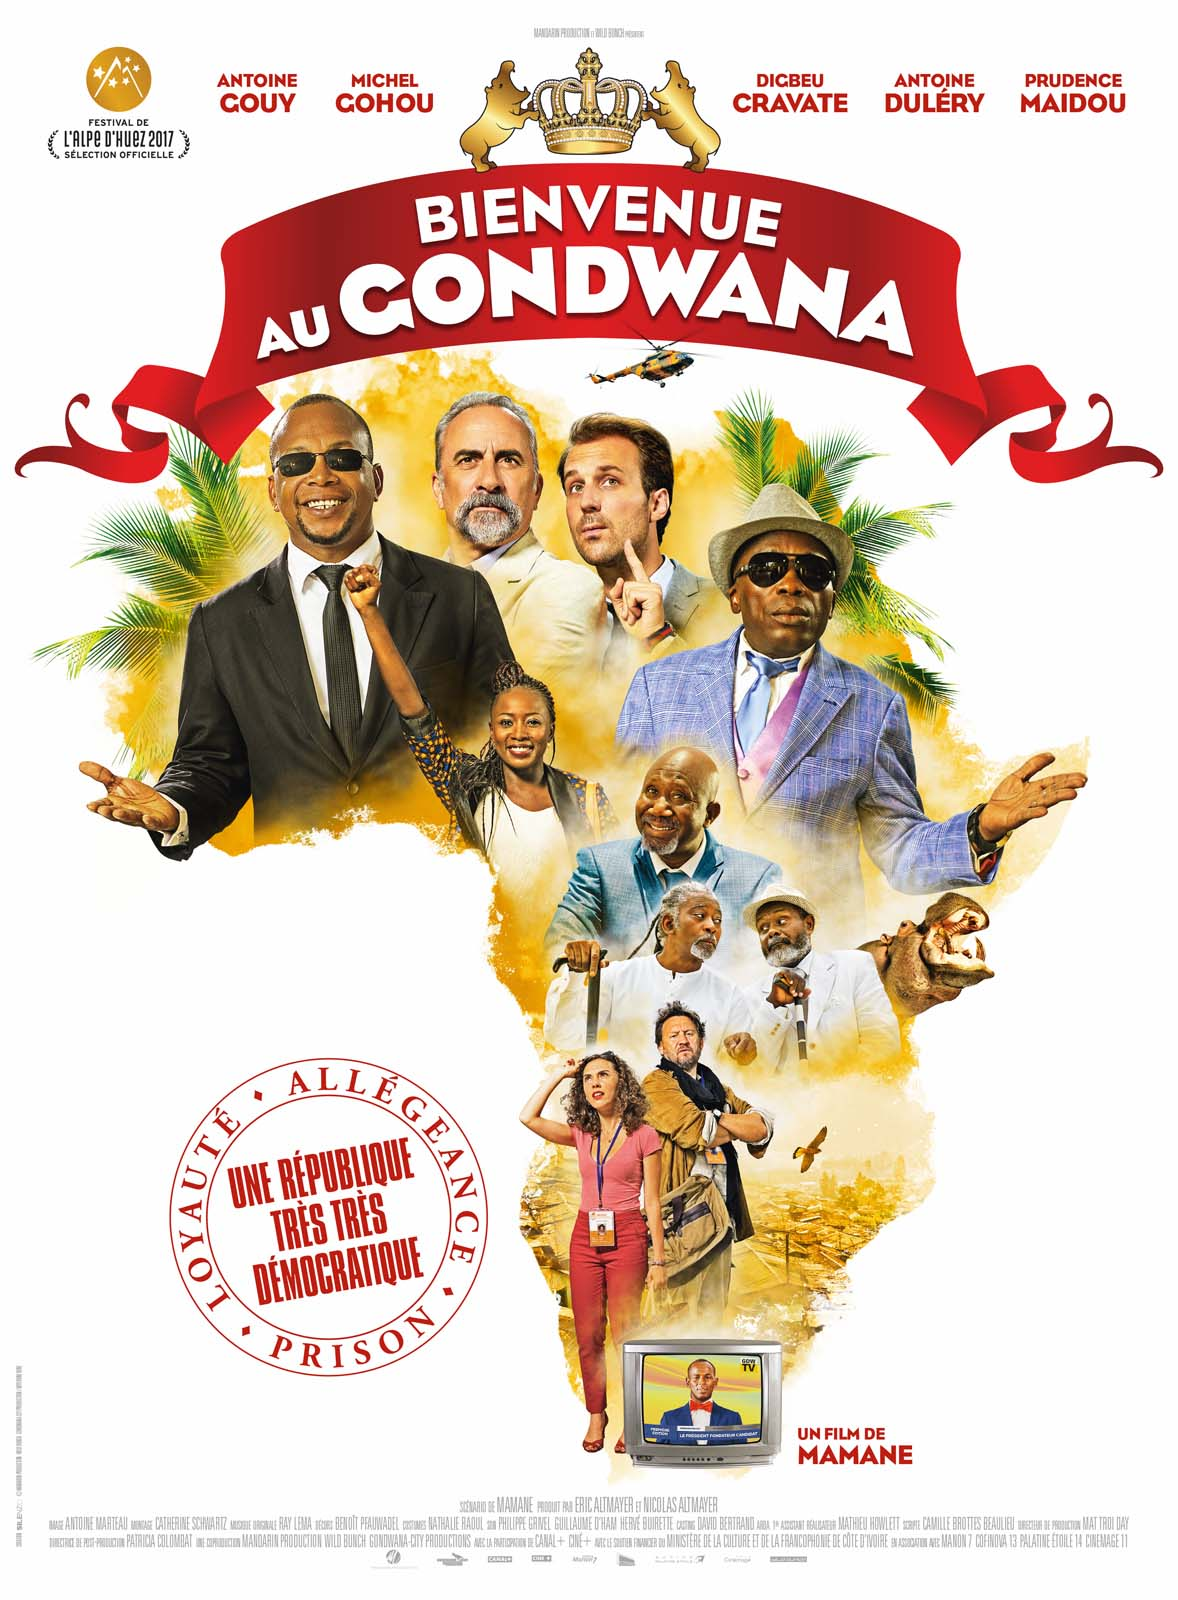 Bienvenue au Gondwana DvdToile